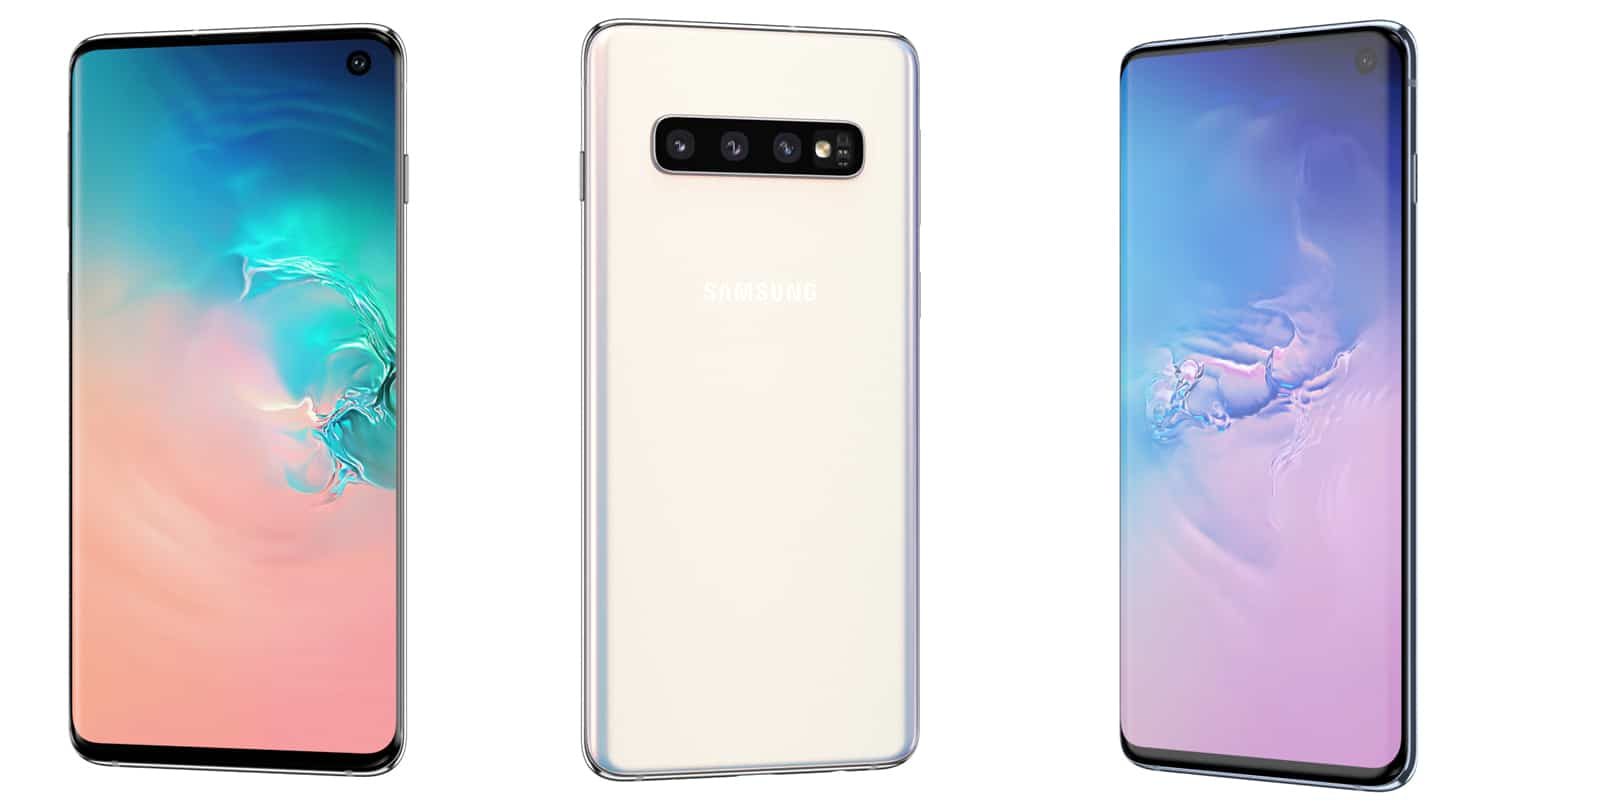 Galaxy S10 - smartphones